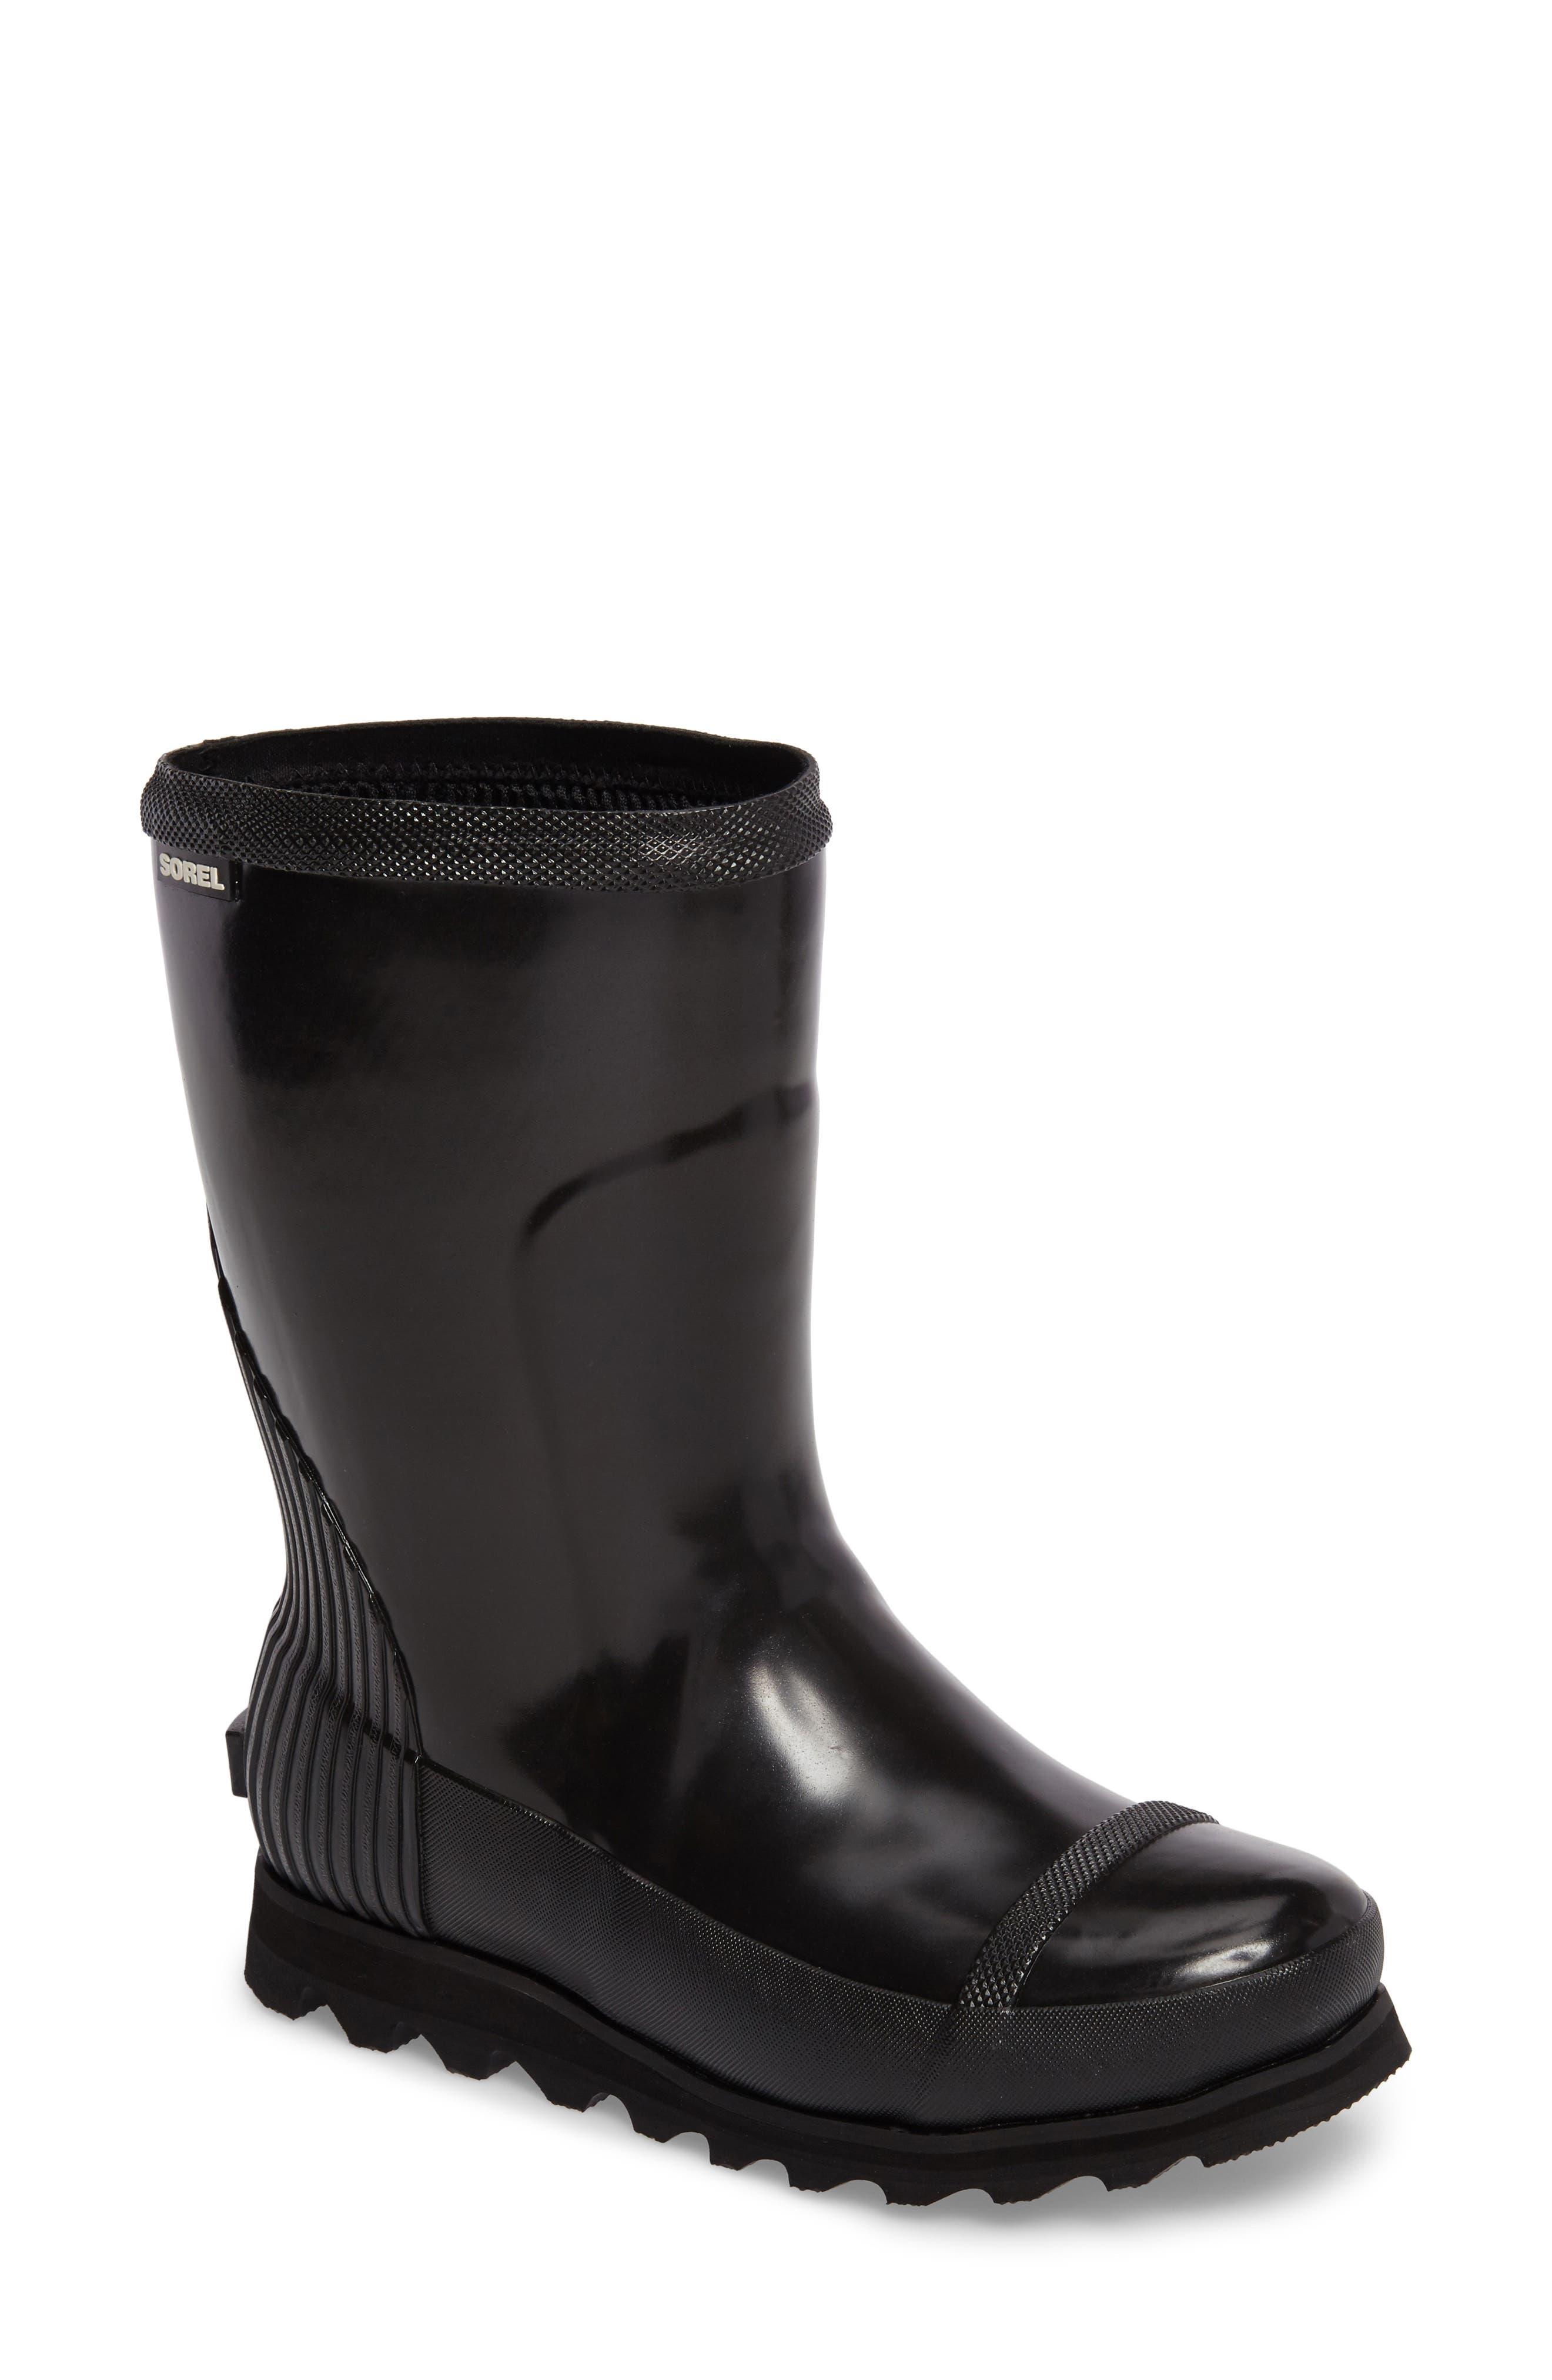 Joan Glossy Short Rain Boot,                         Main,                         color, 010